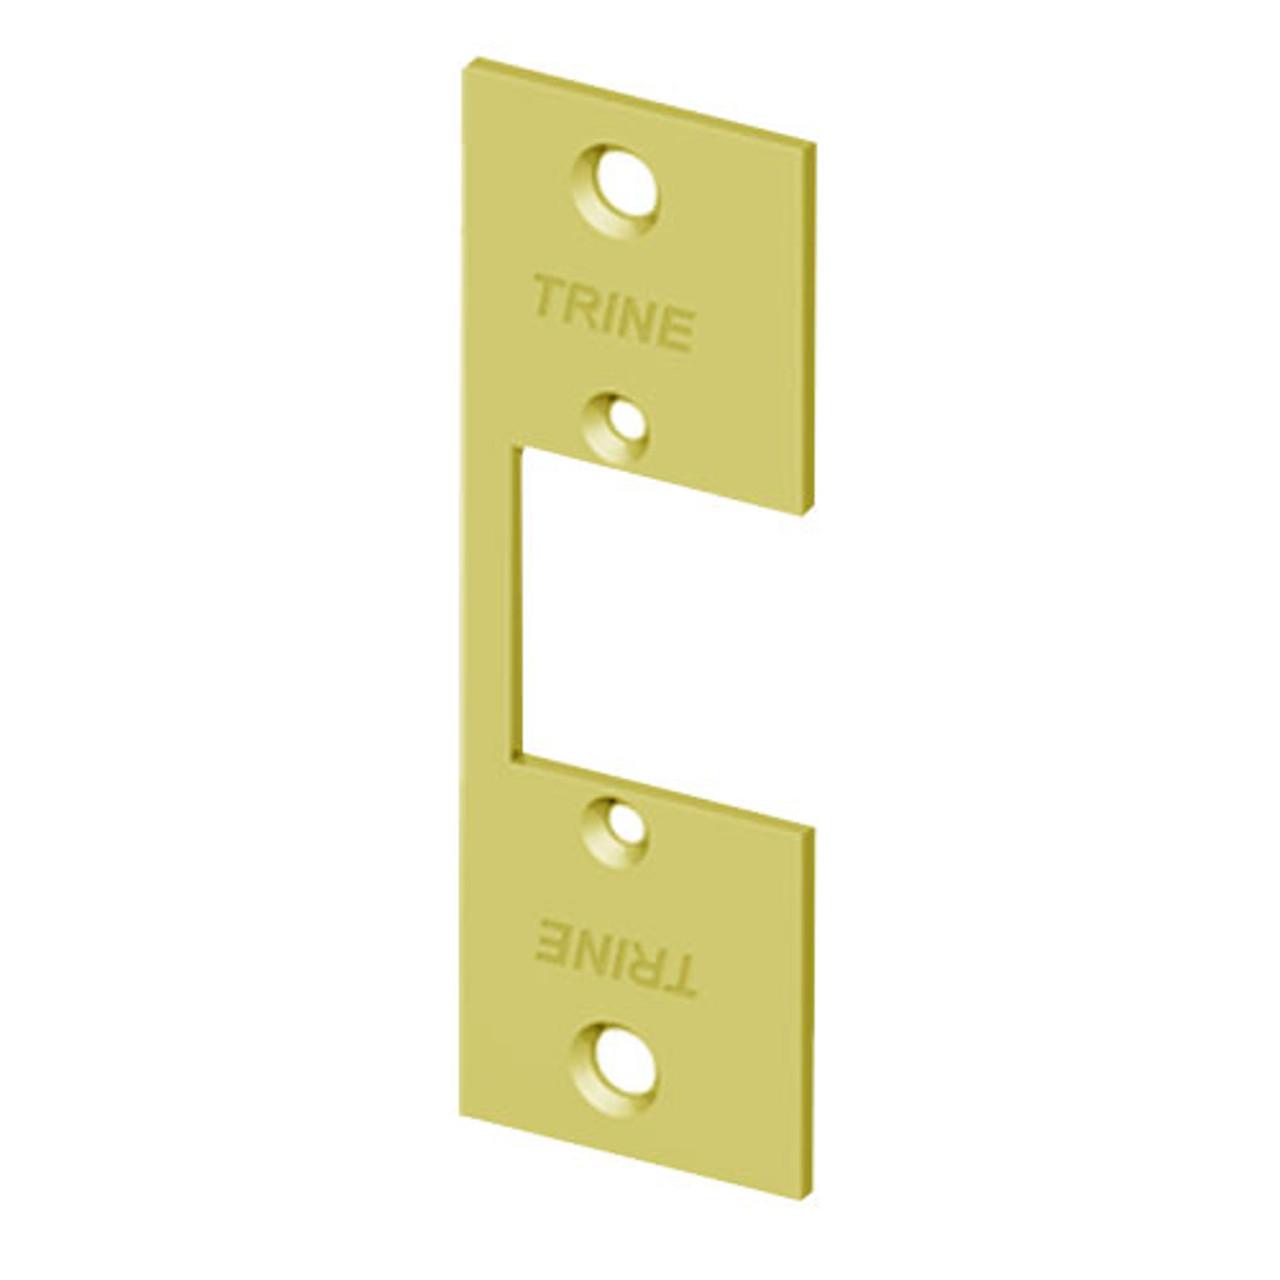 334-US3 Trine 3000 Series Faceplate in Bright Brass Finish